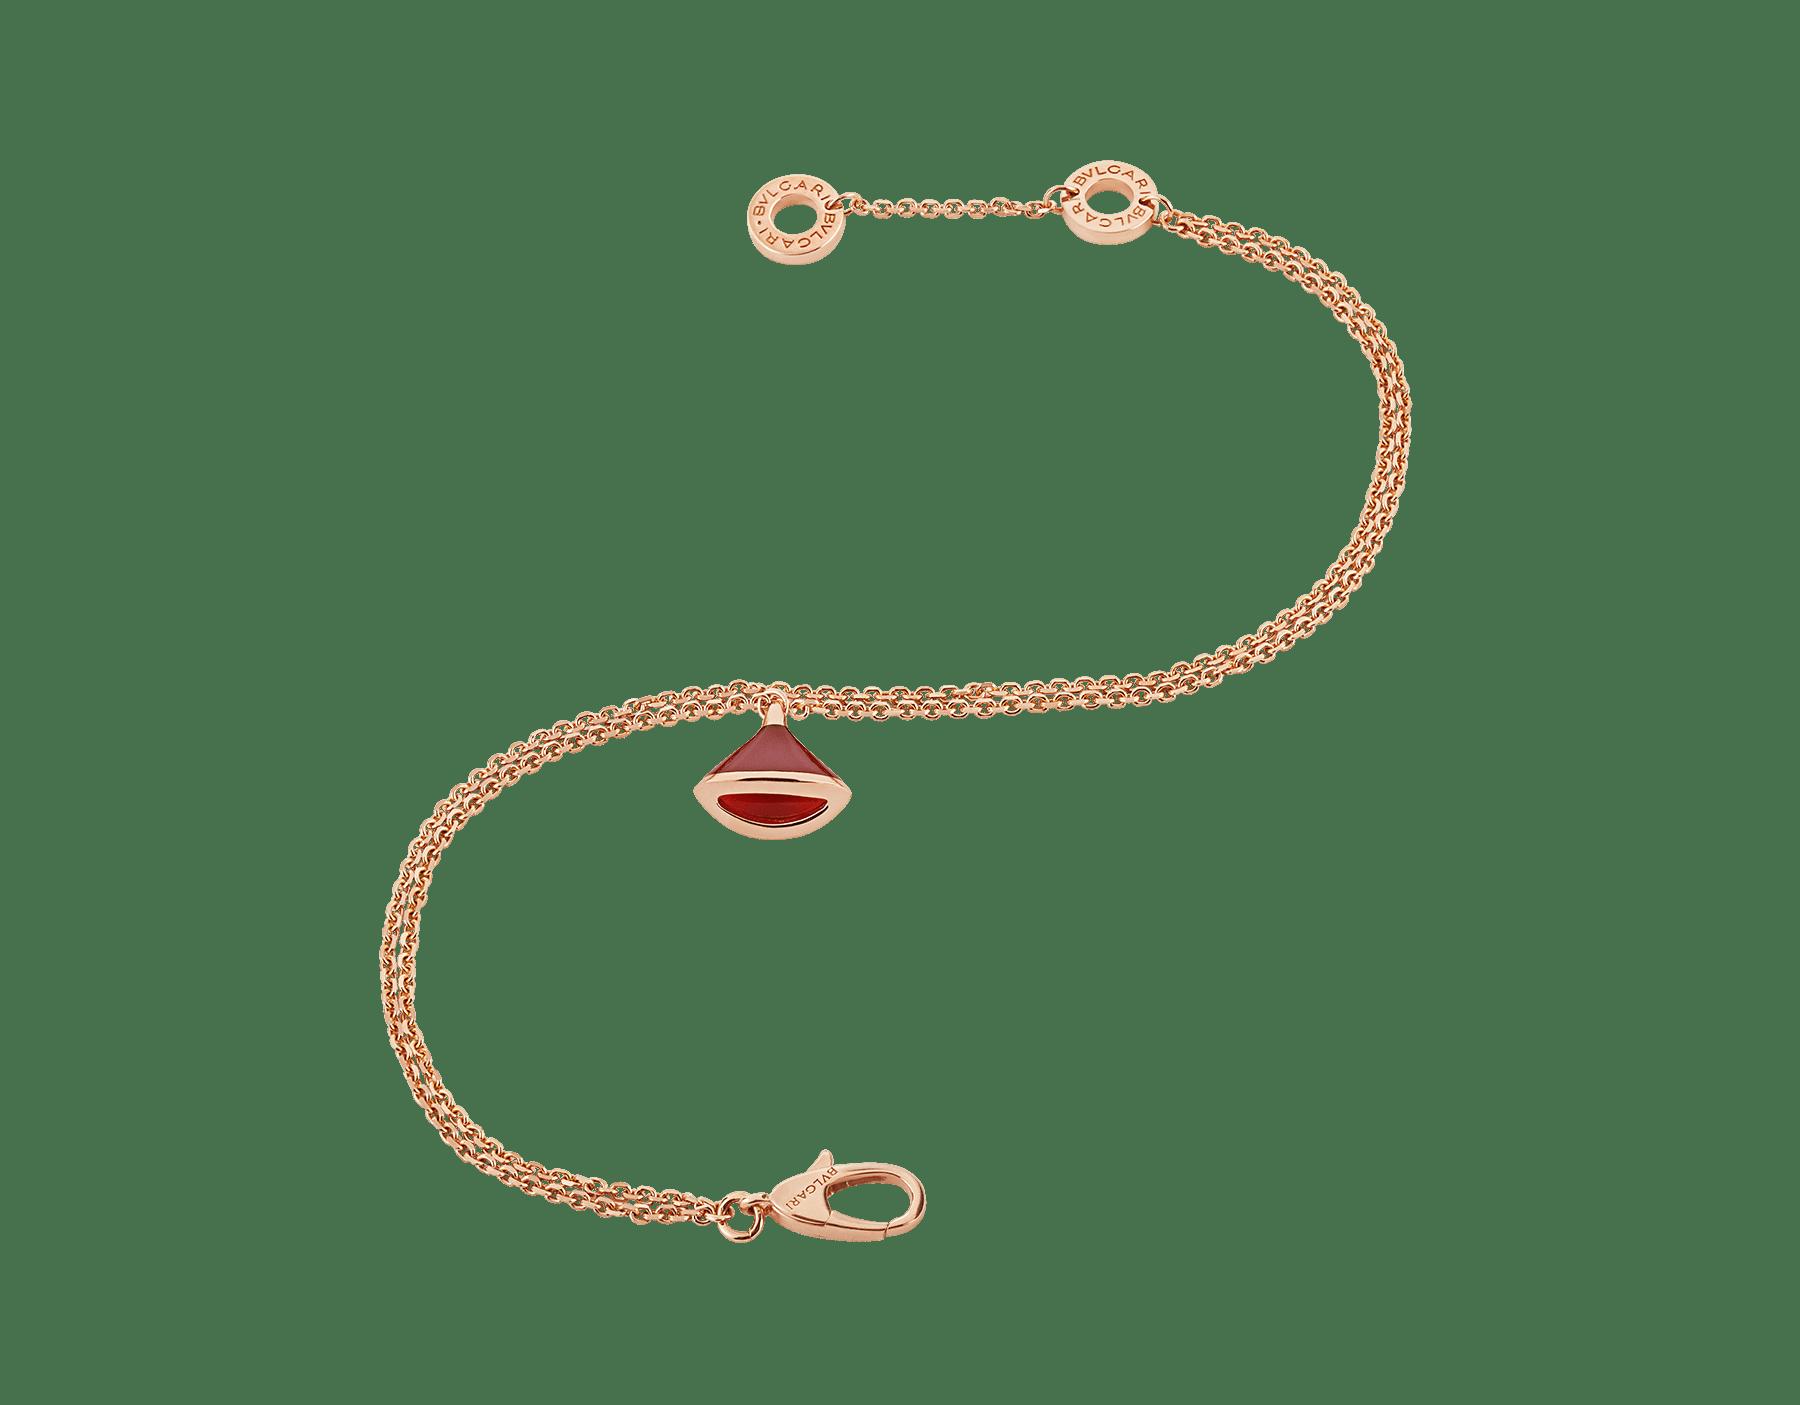 18Kピンクゴールド製ディーヴァ ドリーム ブレスレット。カーネリアンをあしらった18Kピンクゴールド製ペンダントトップ付き。 BR857194 image 2